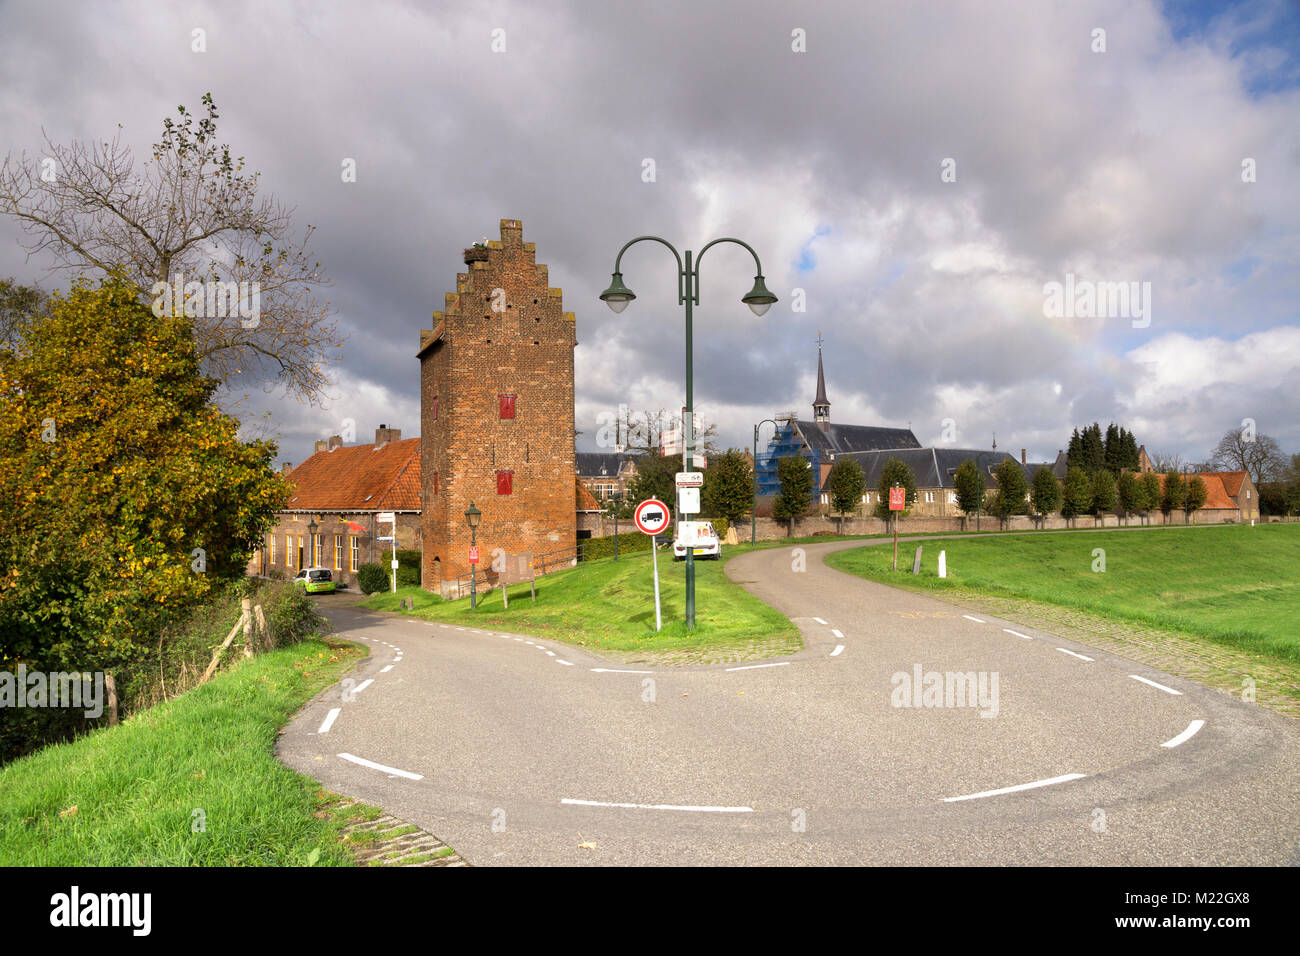 The prisoners tower in Megen - Stock Image